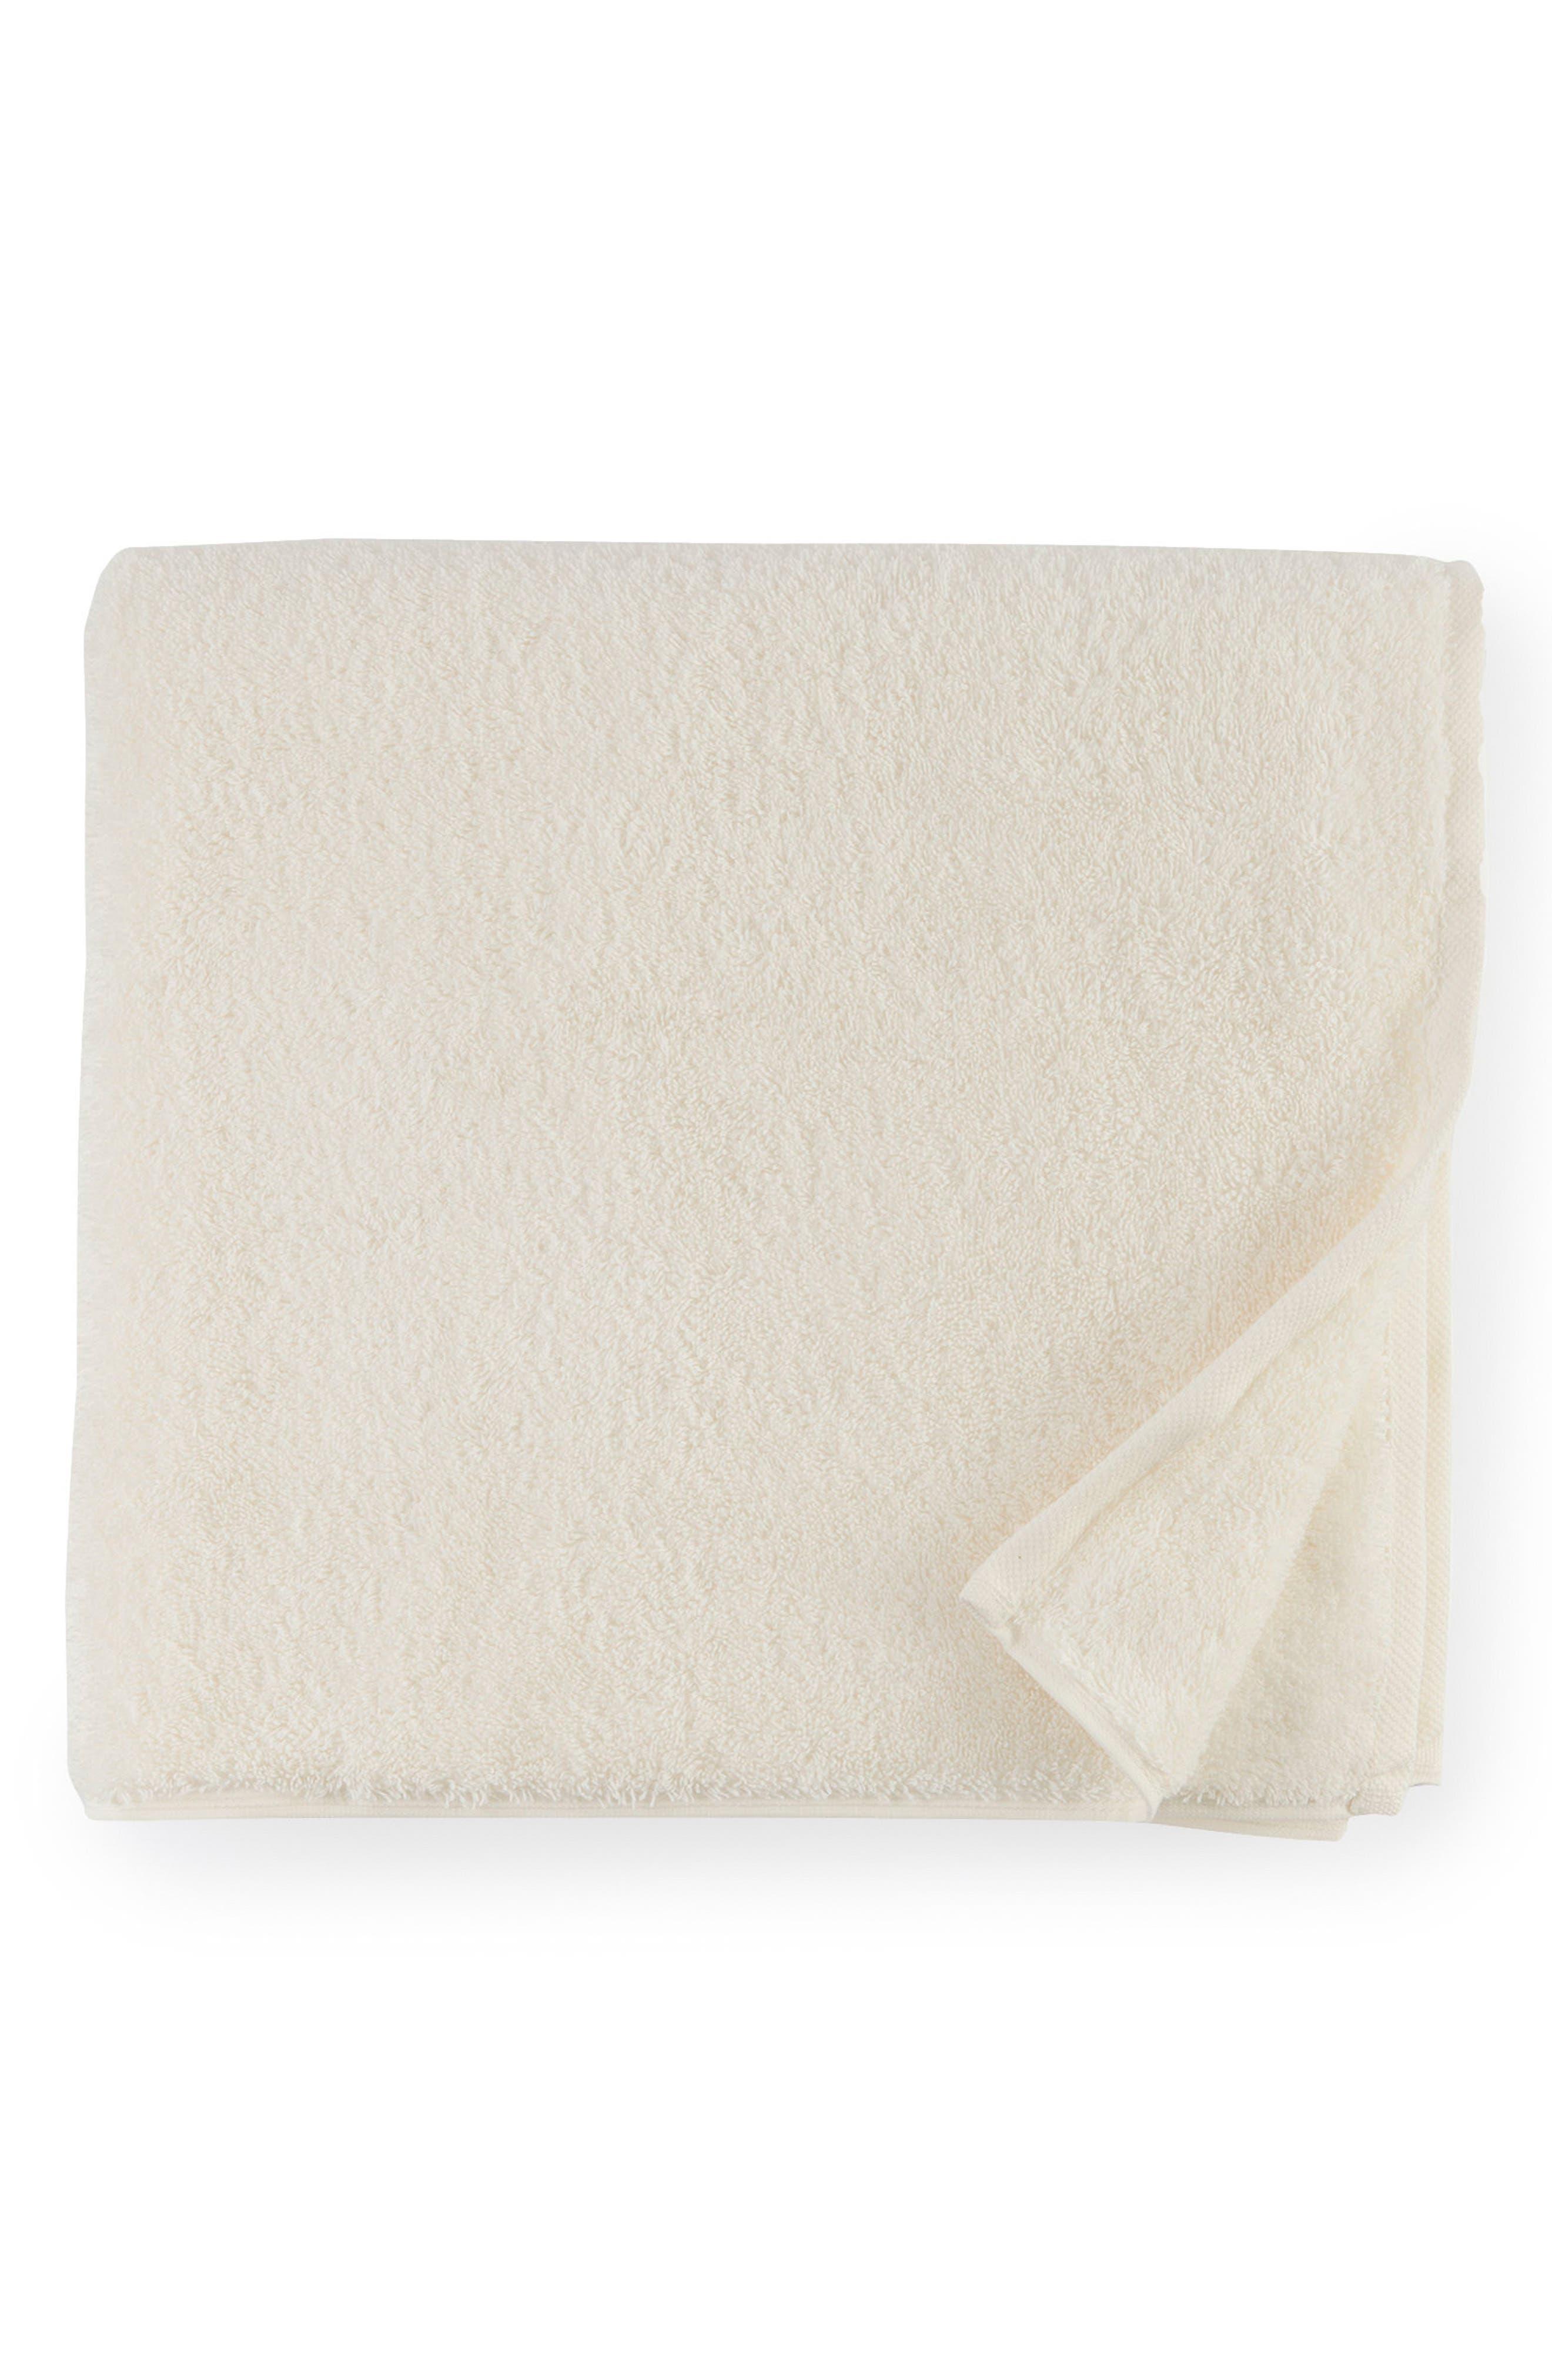 Sarma Hand Towel,                         Main,                         color, Ivory